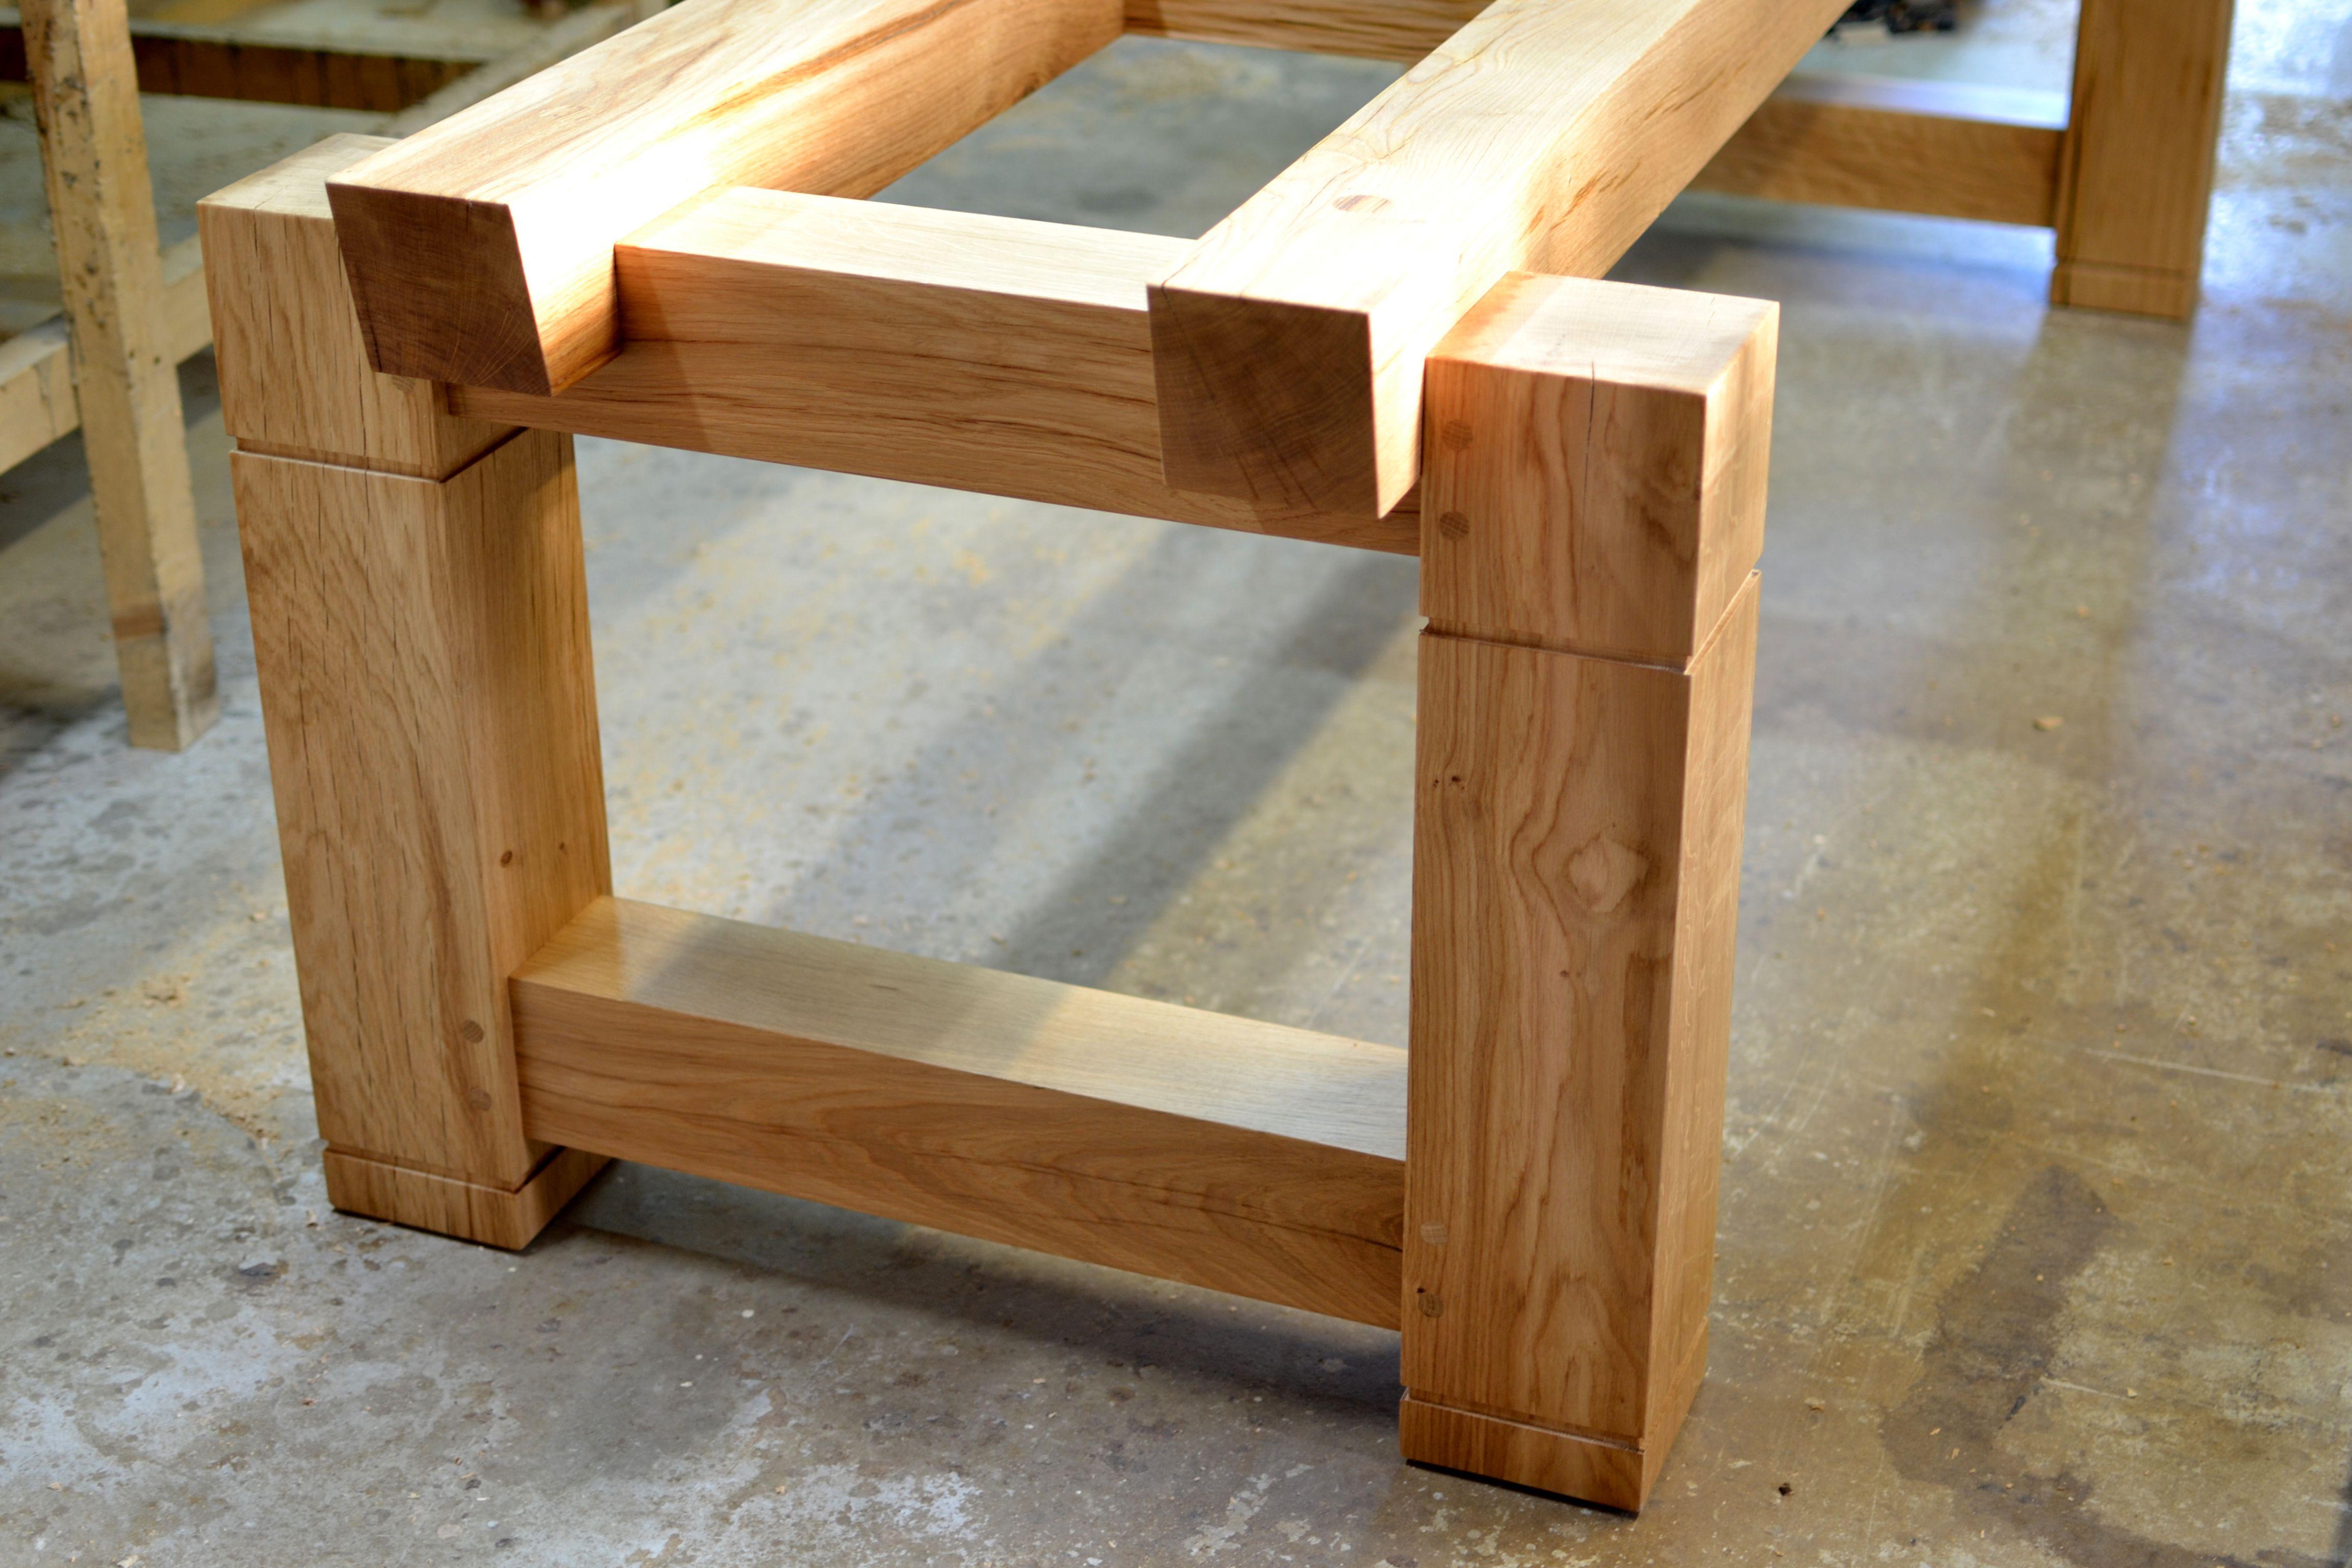 Bespoke Table With Glass Top Handmade Oak Dining Tables By Makers Bespoke Dining Table Dining Table Wood Table Legs [ 3072 x 4608 Pixel ]